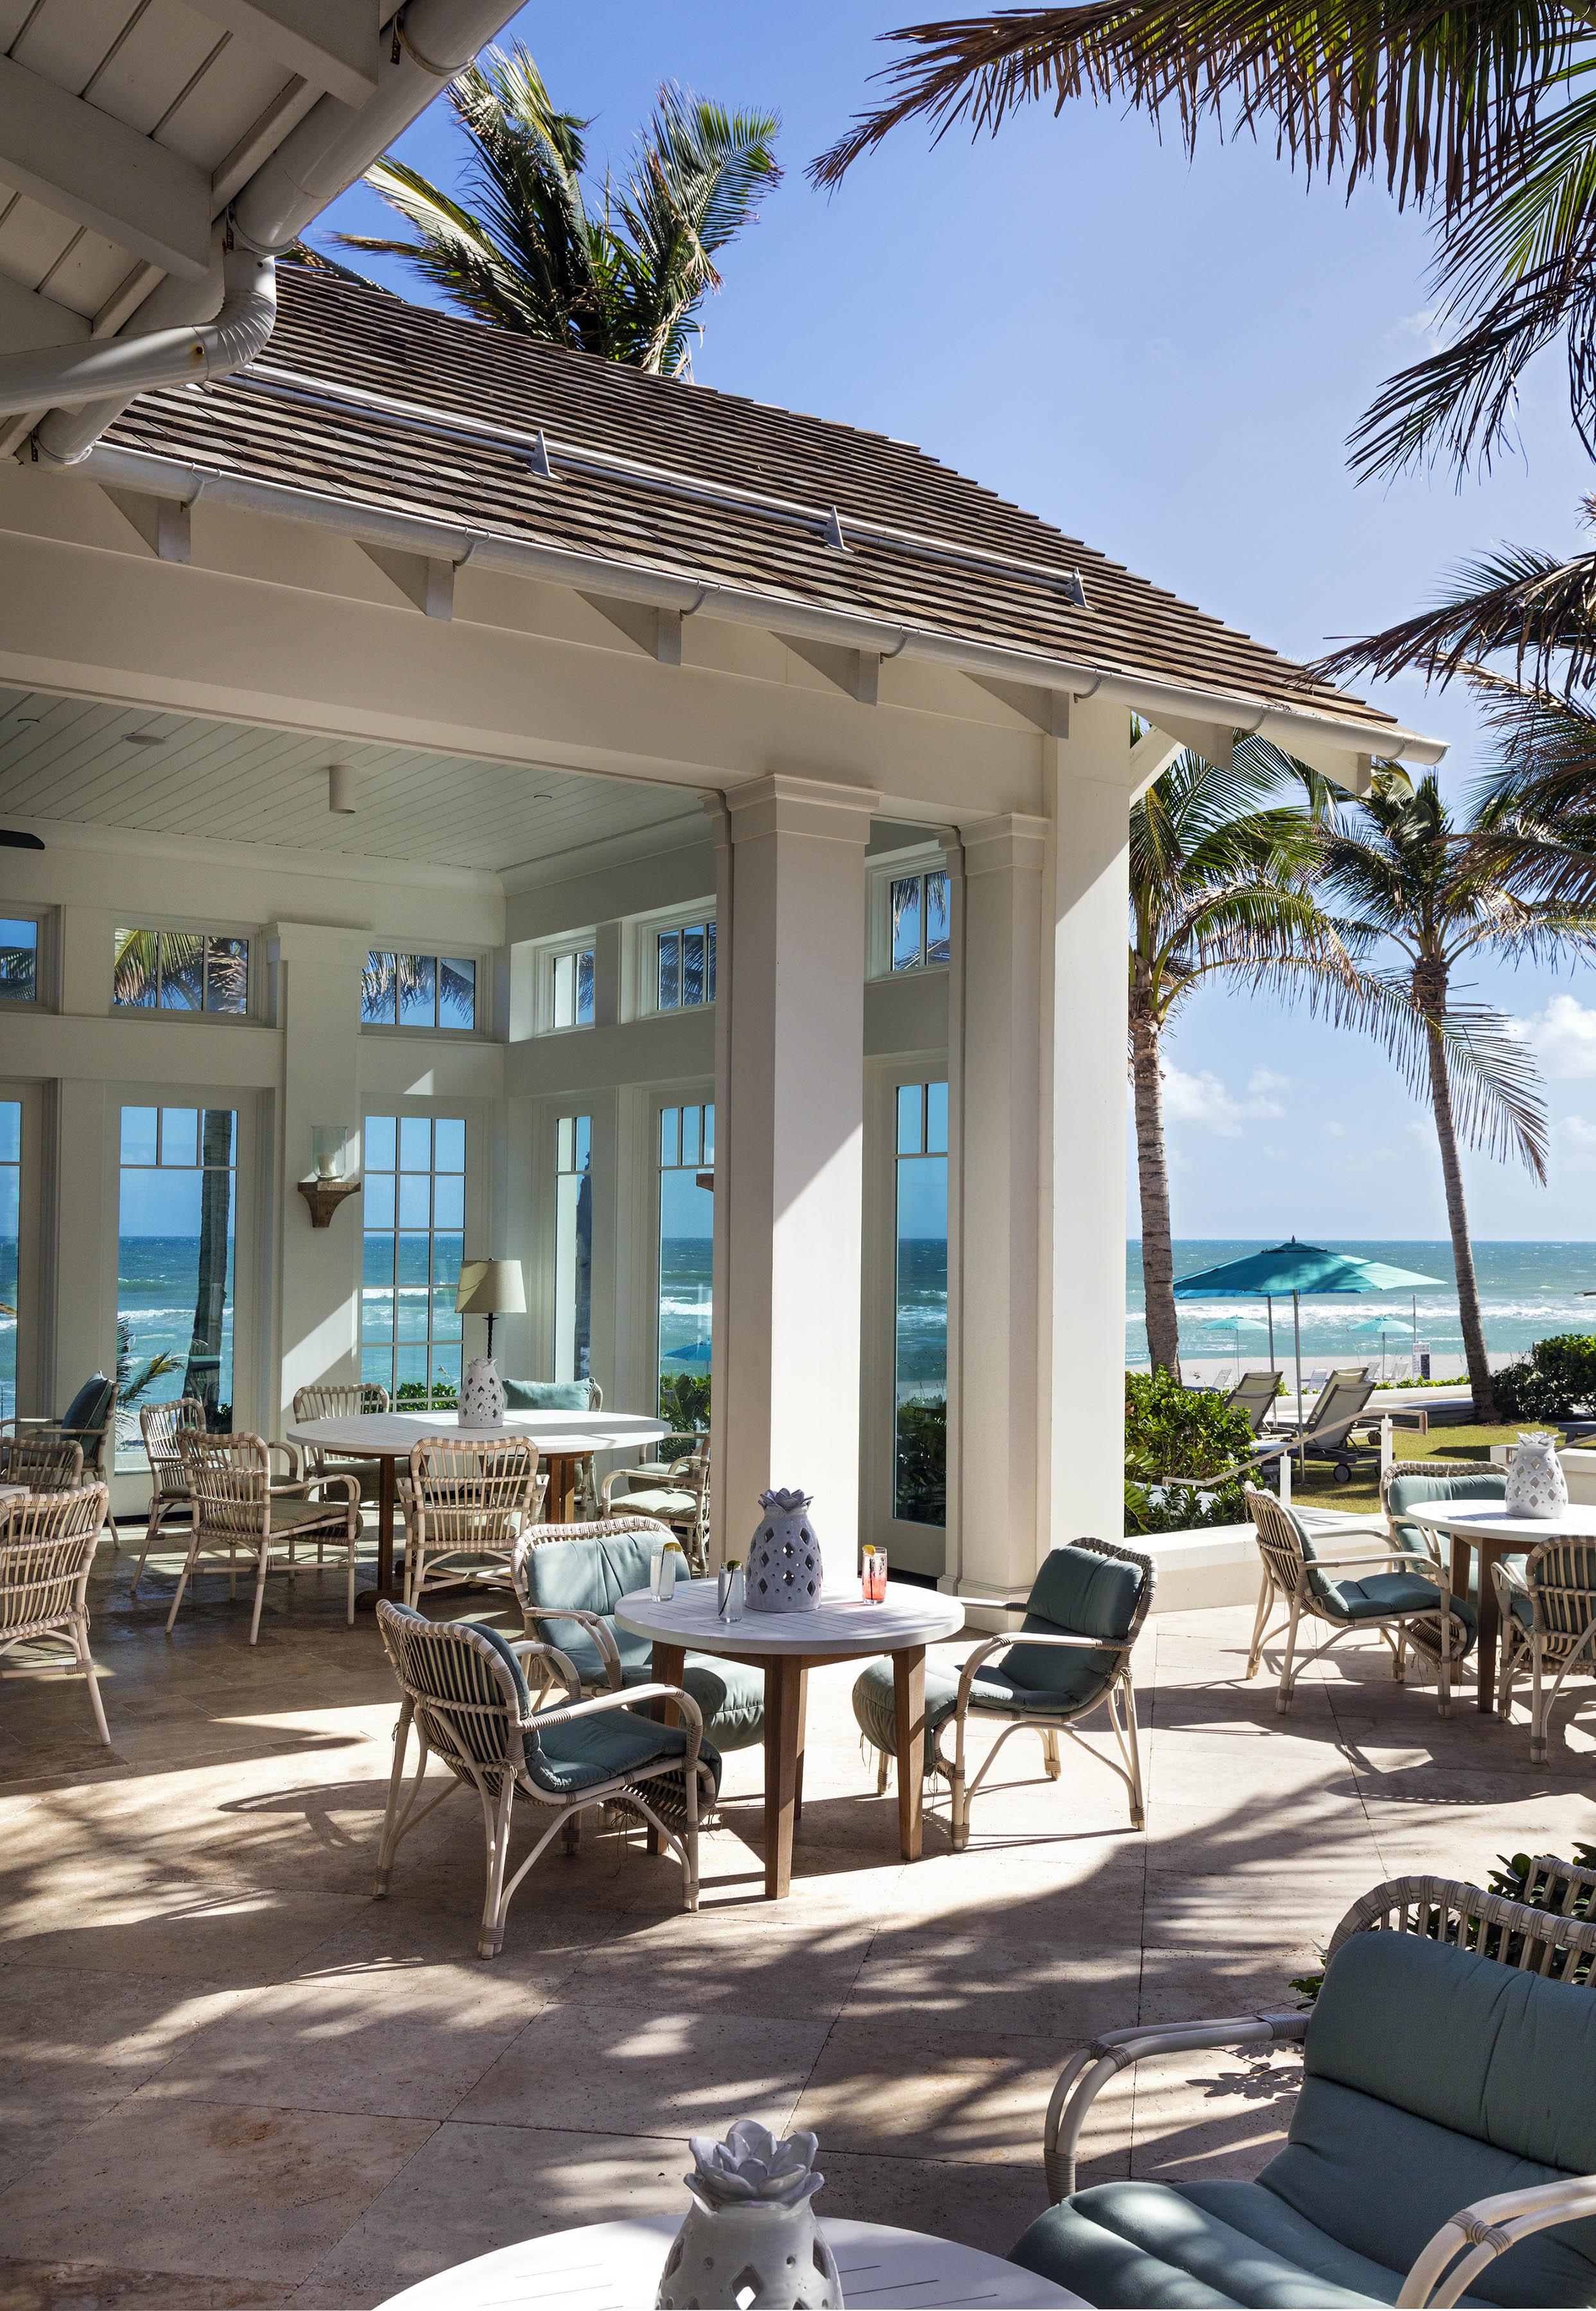 Jupiter Island Club, Location: Hobe Sound FL, Architect: Hart Howerton Architects